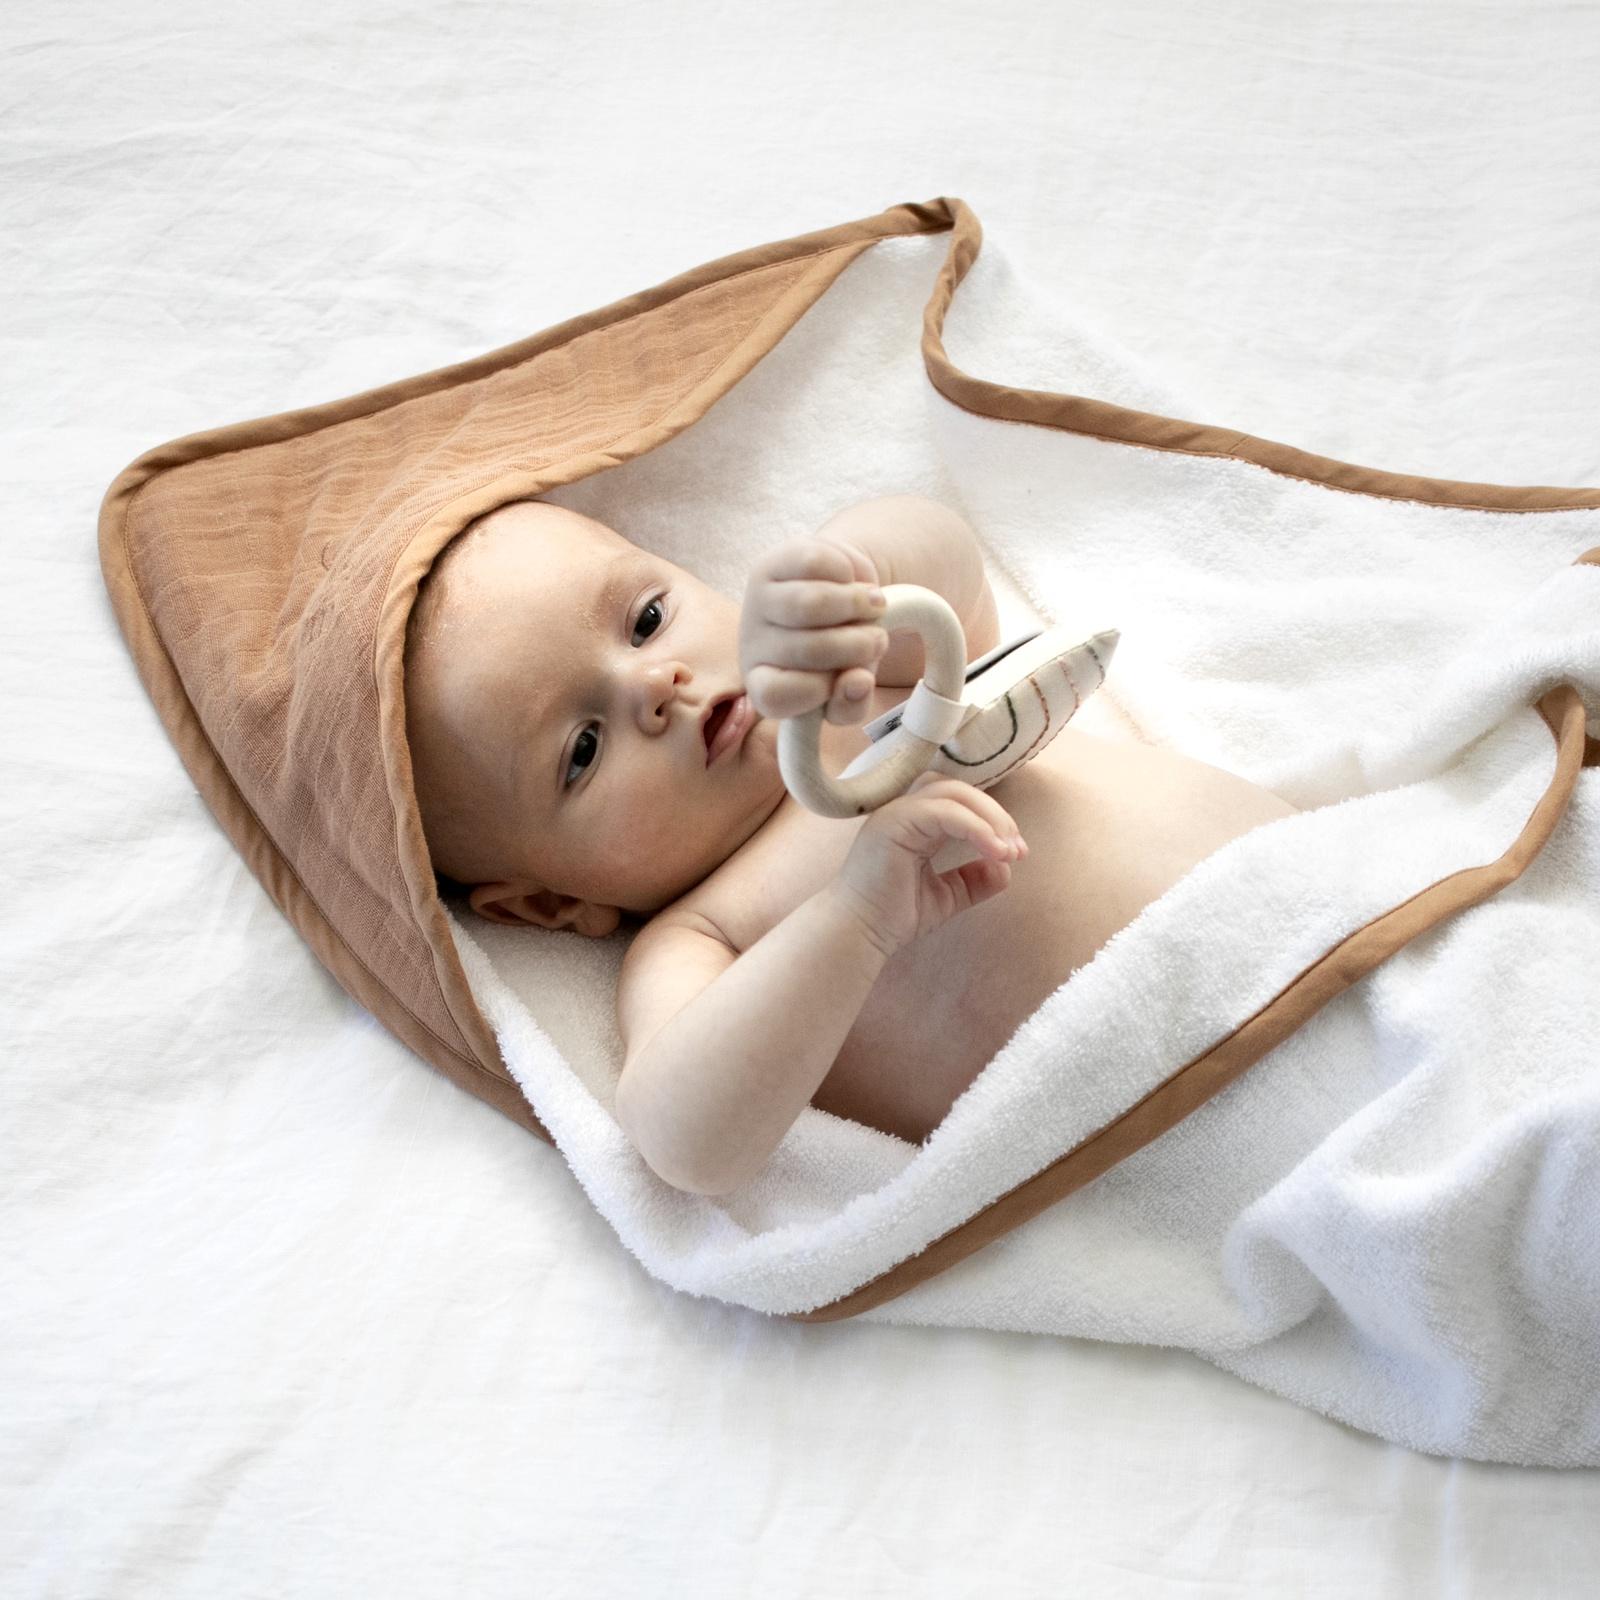 BABY HOODED TOWEL - TAWNY BROWN